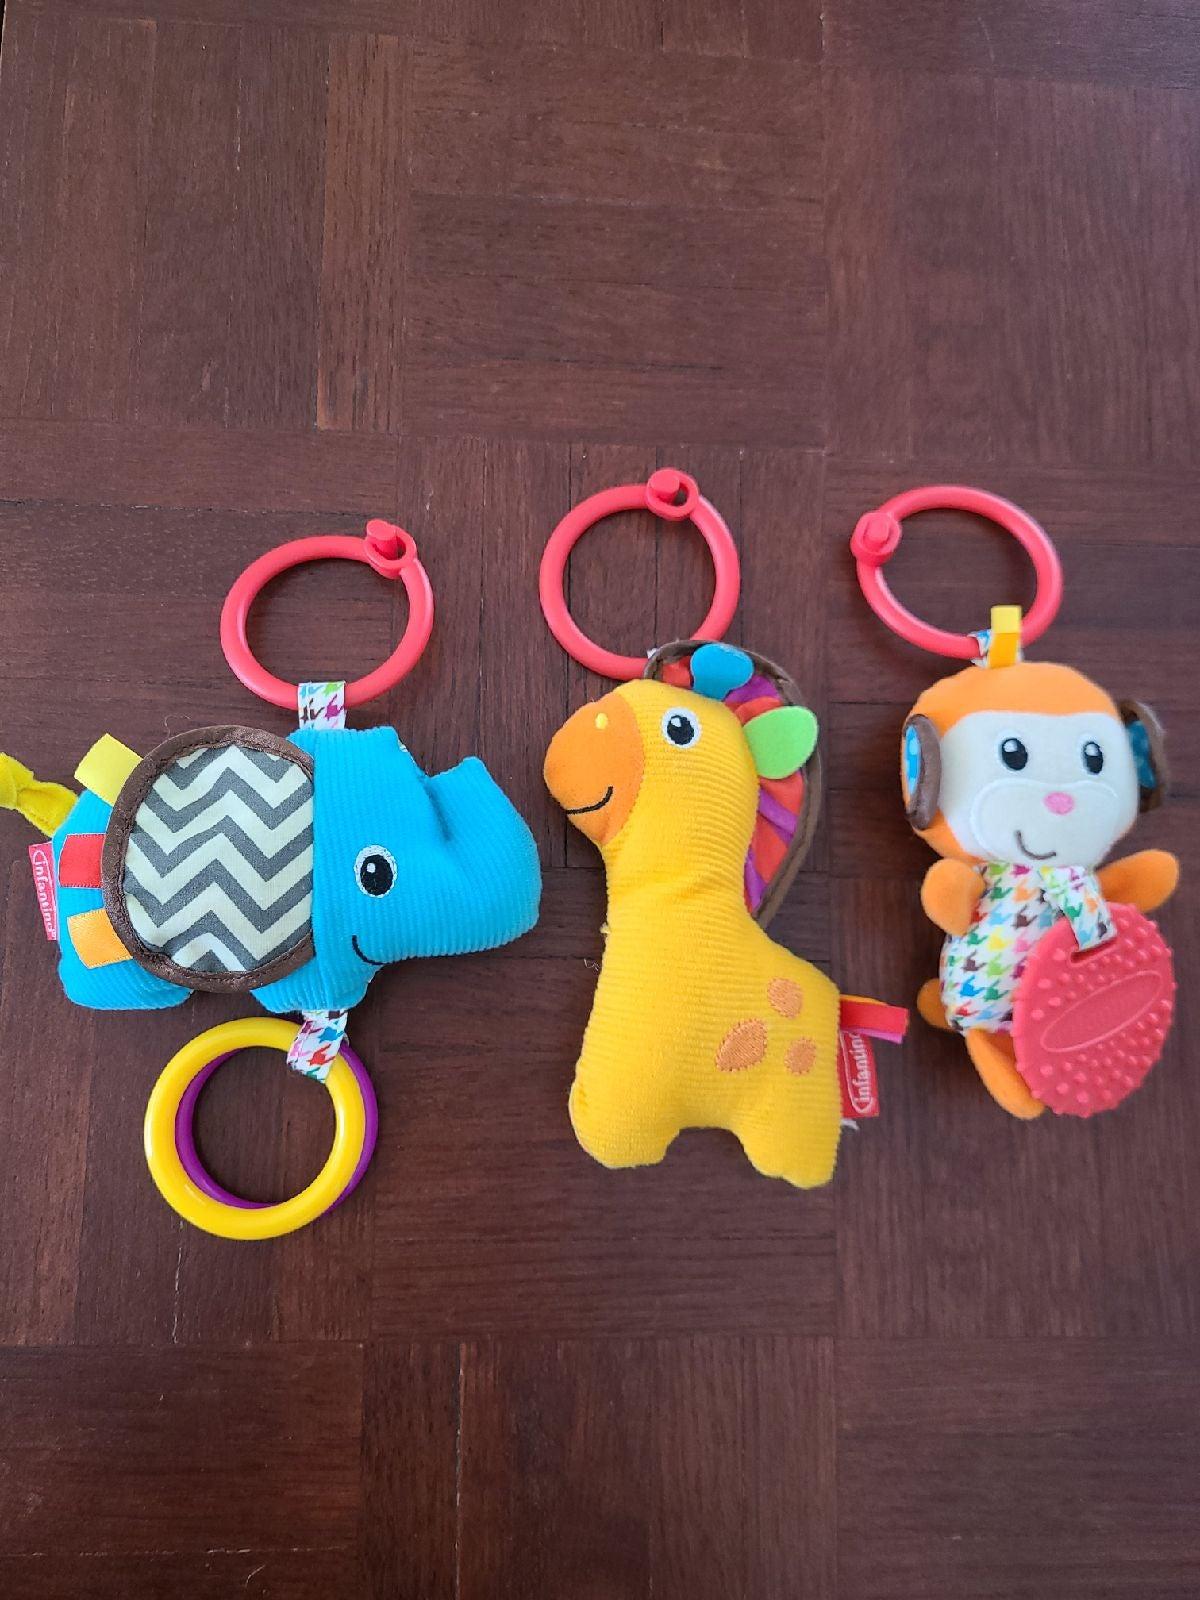 Infantino baby toys